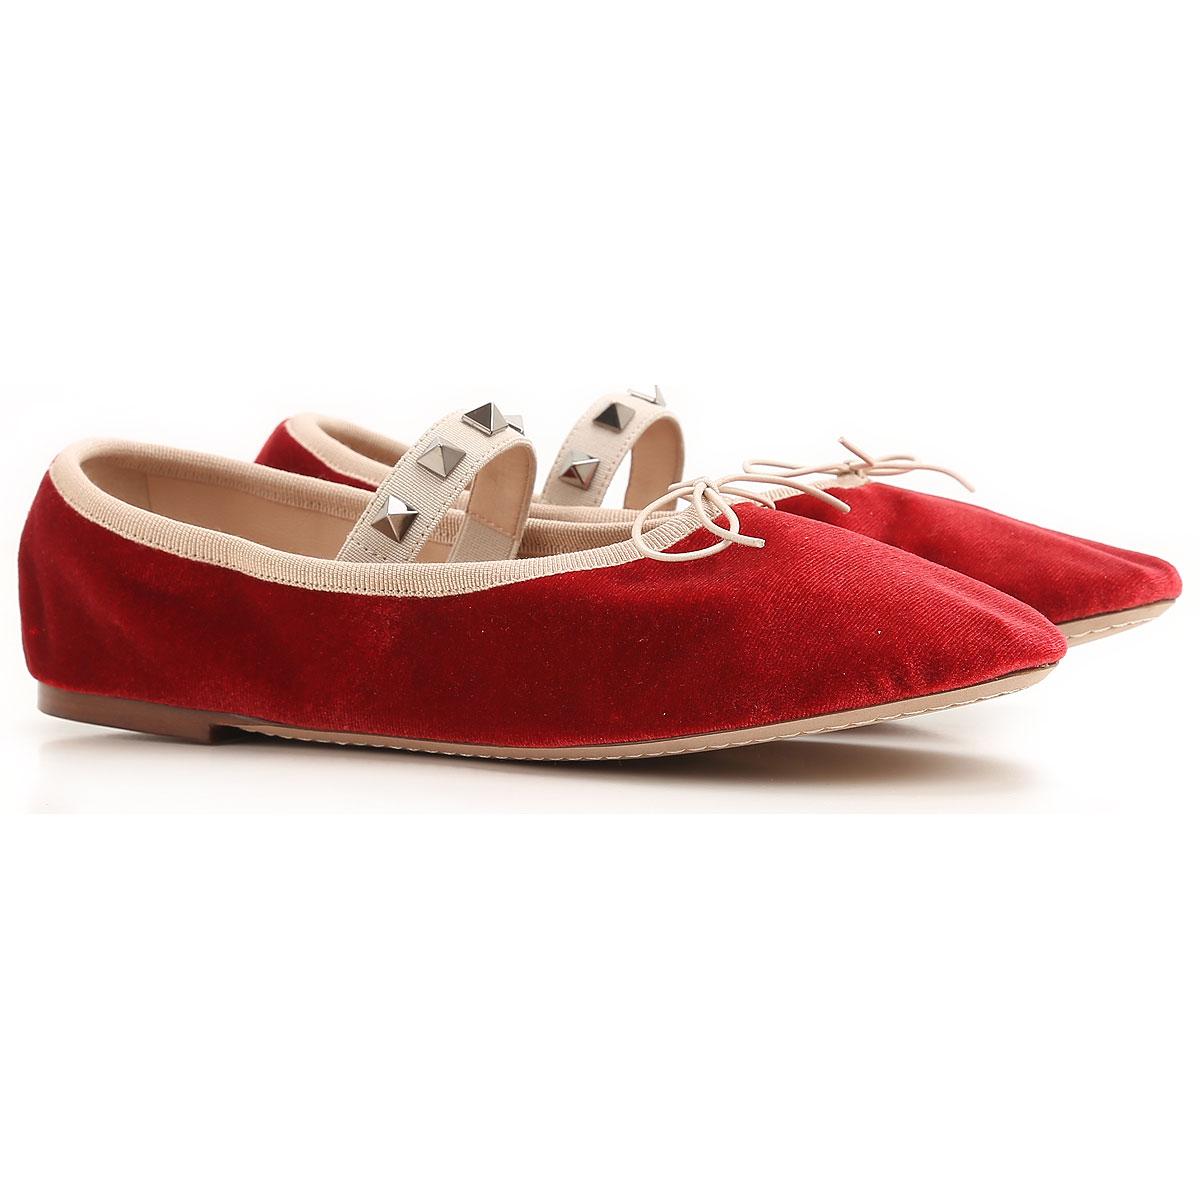 Womens Shoes Valentino Garavani Style code lw0s0a93 gvb 0ro